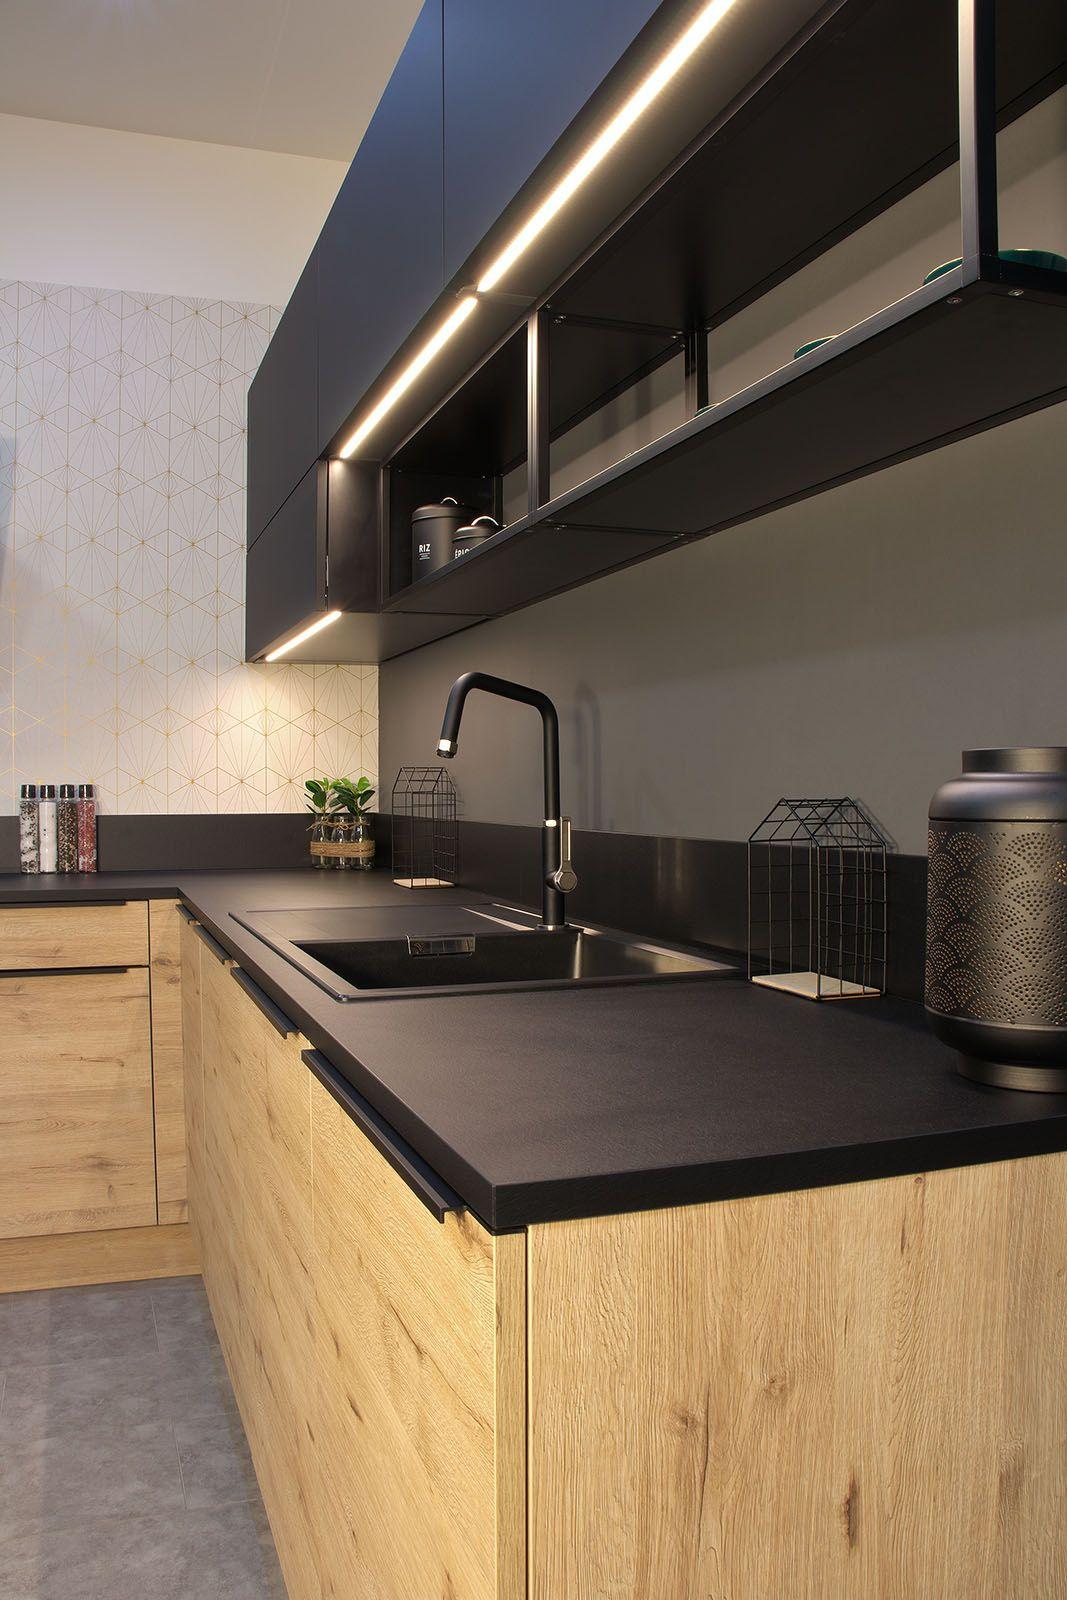 Cuisine design style atelier en 18  Cuisines design, Cuisine